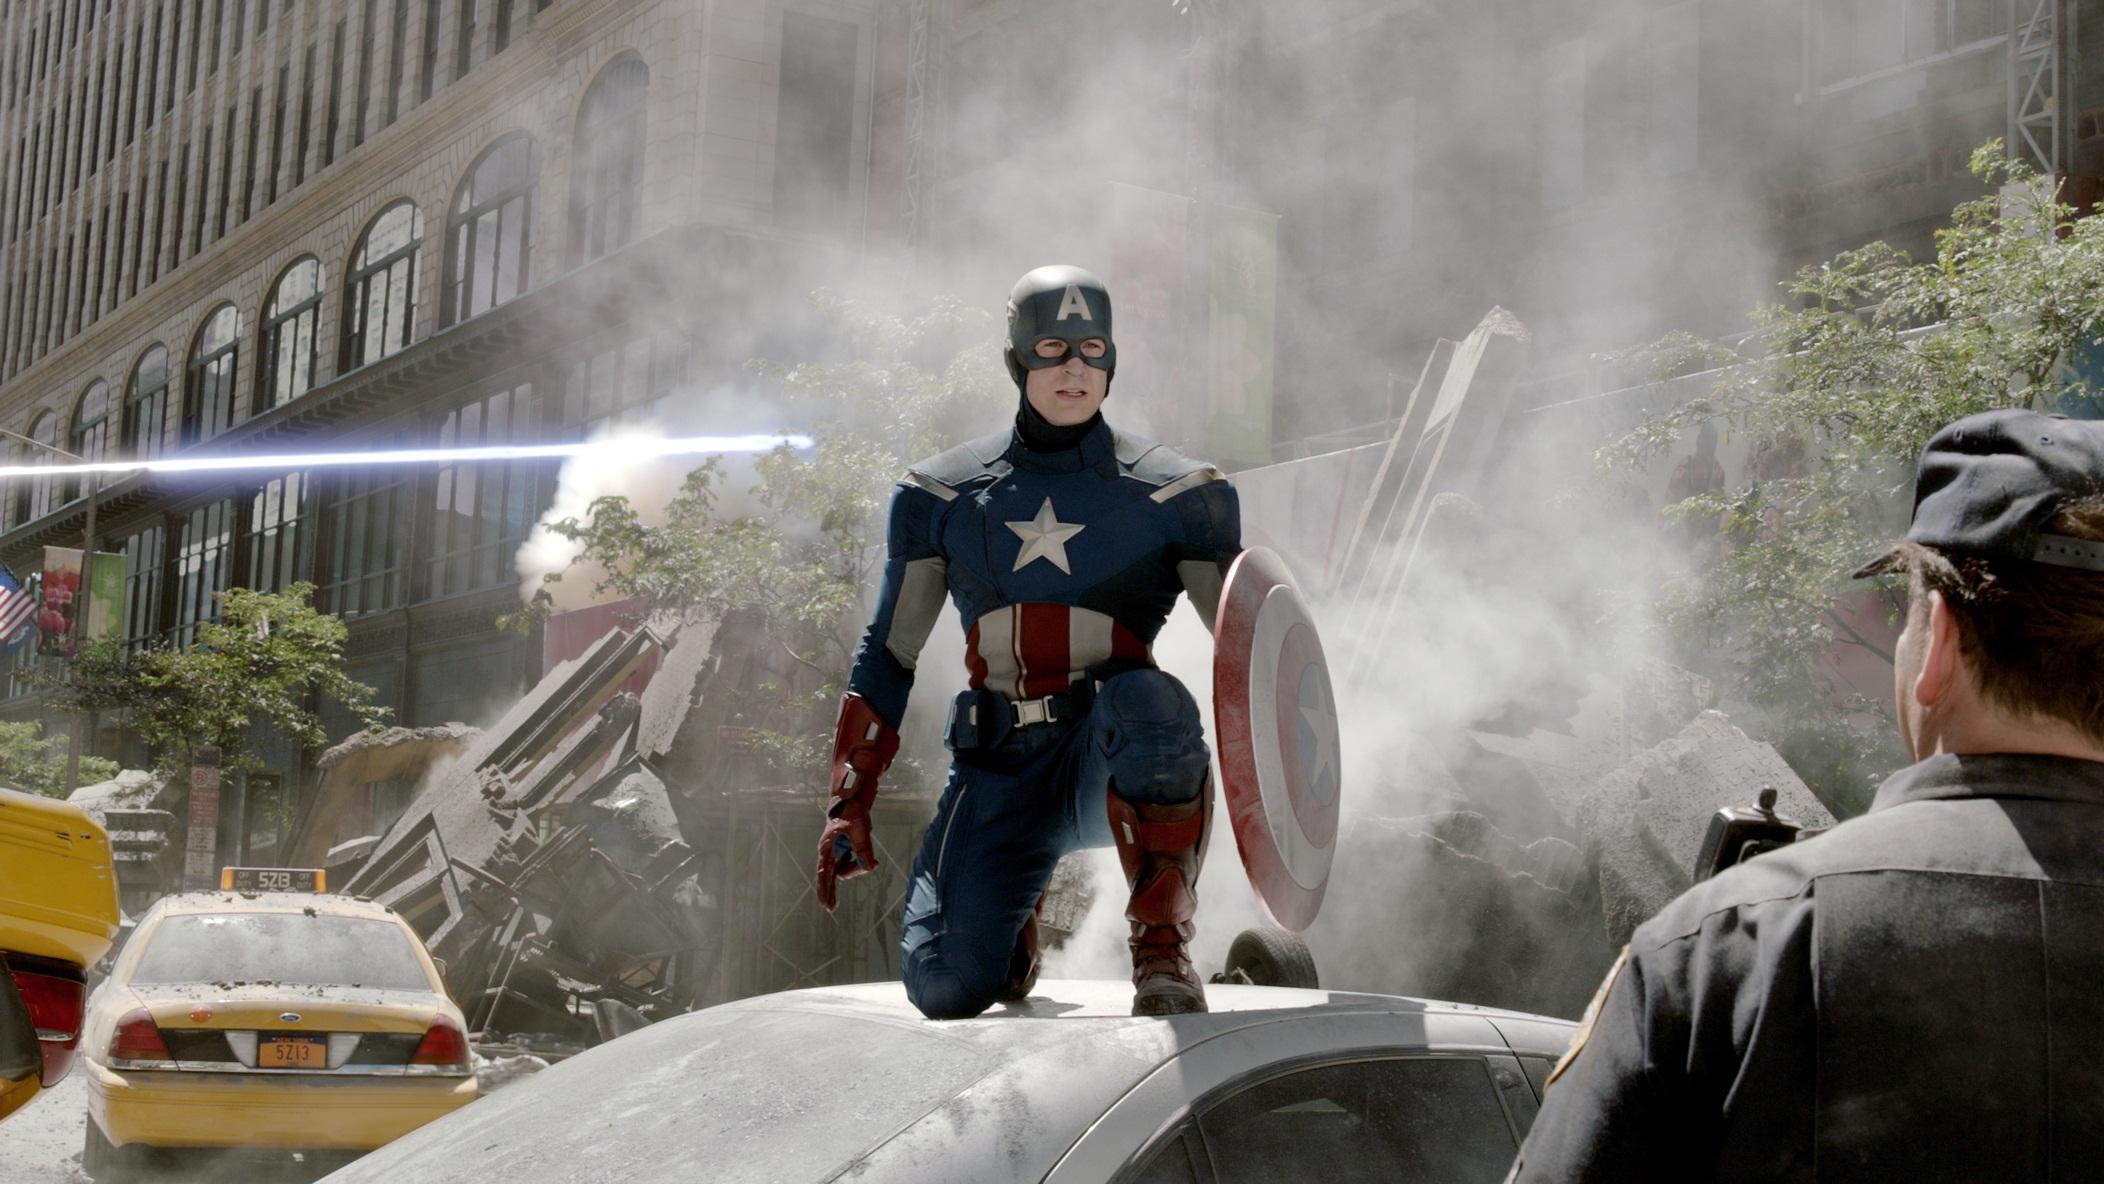 captainamerica2onacar.jpg